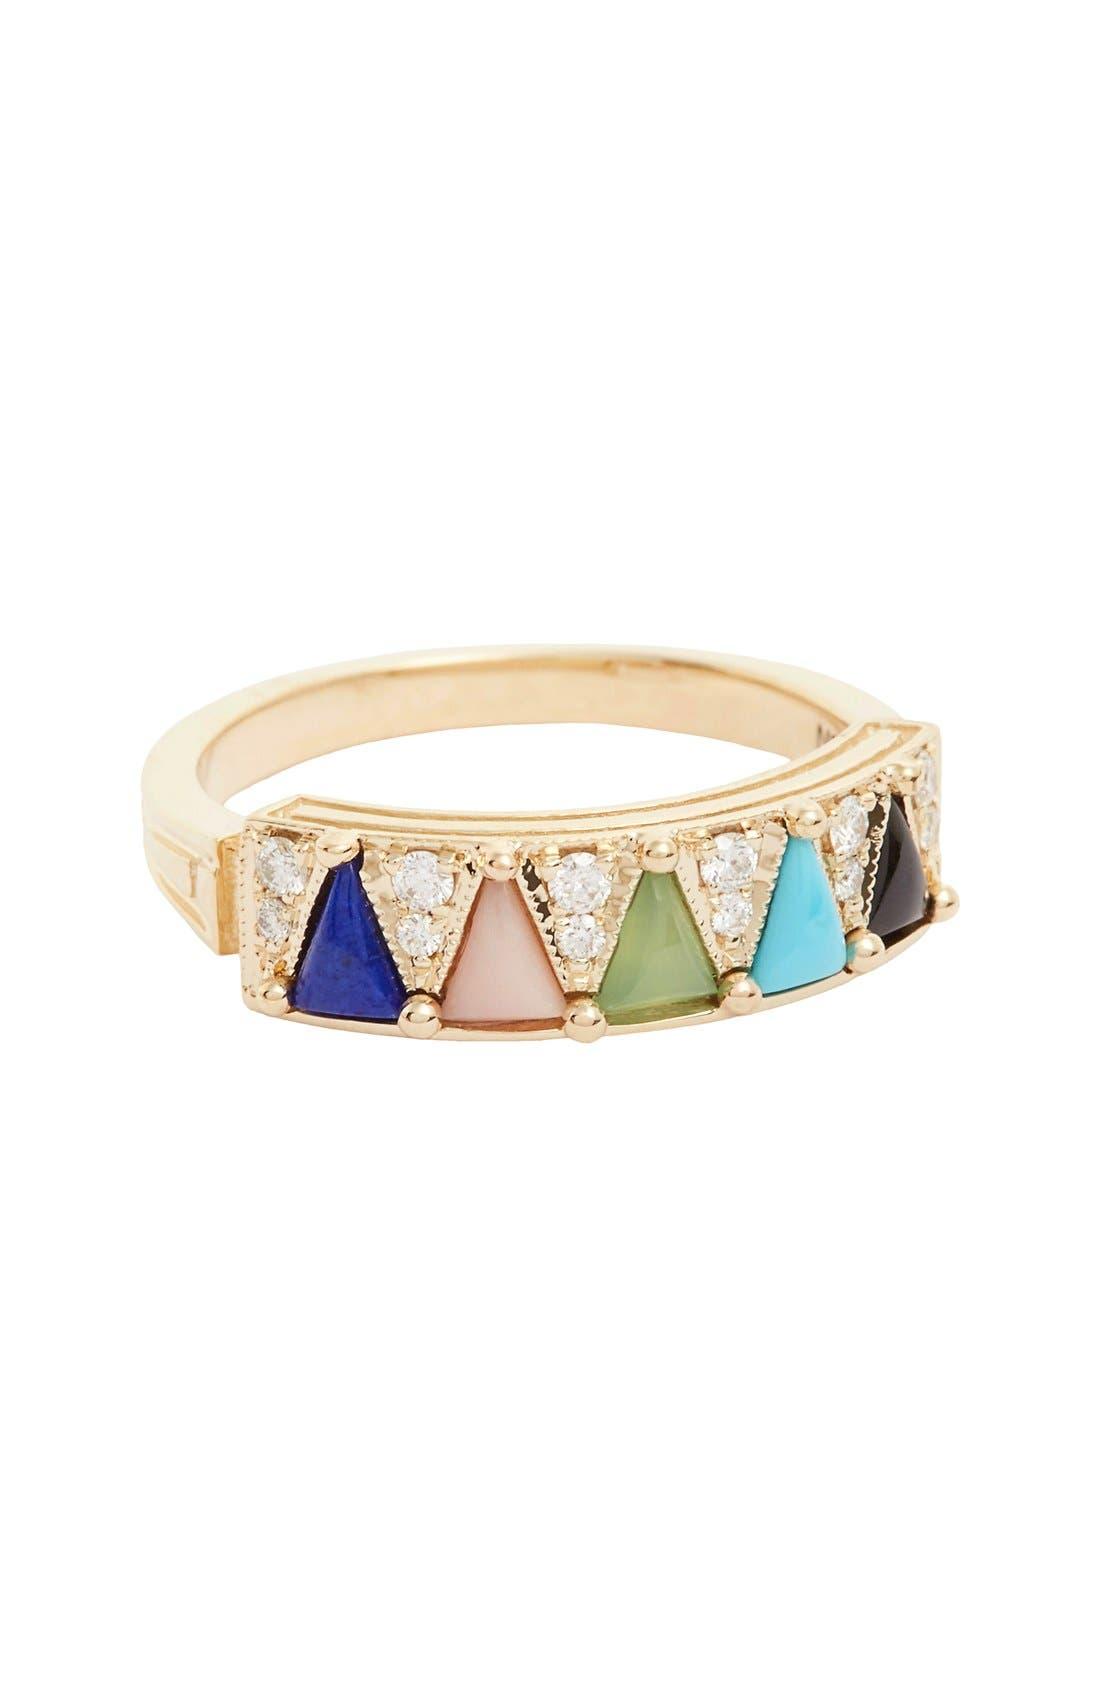 MOCIUN 'Mega' Five Triangle Ring